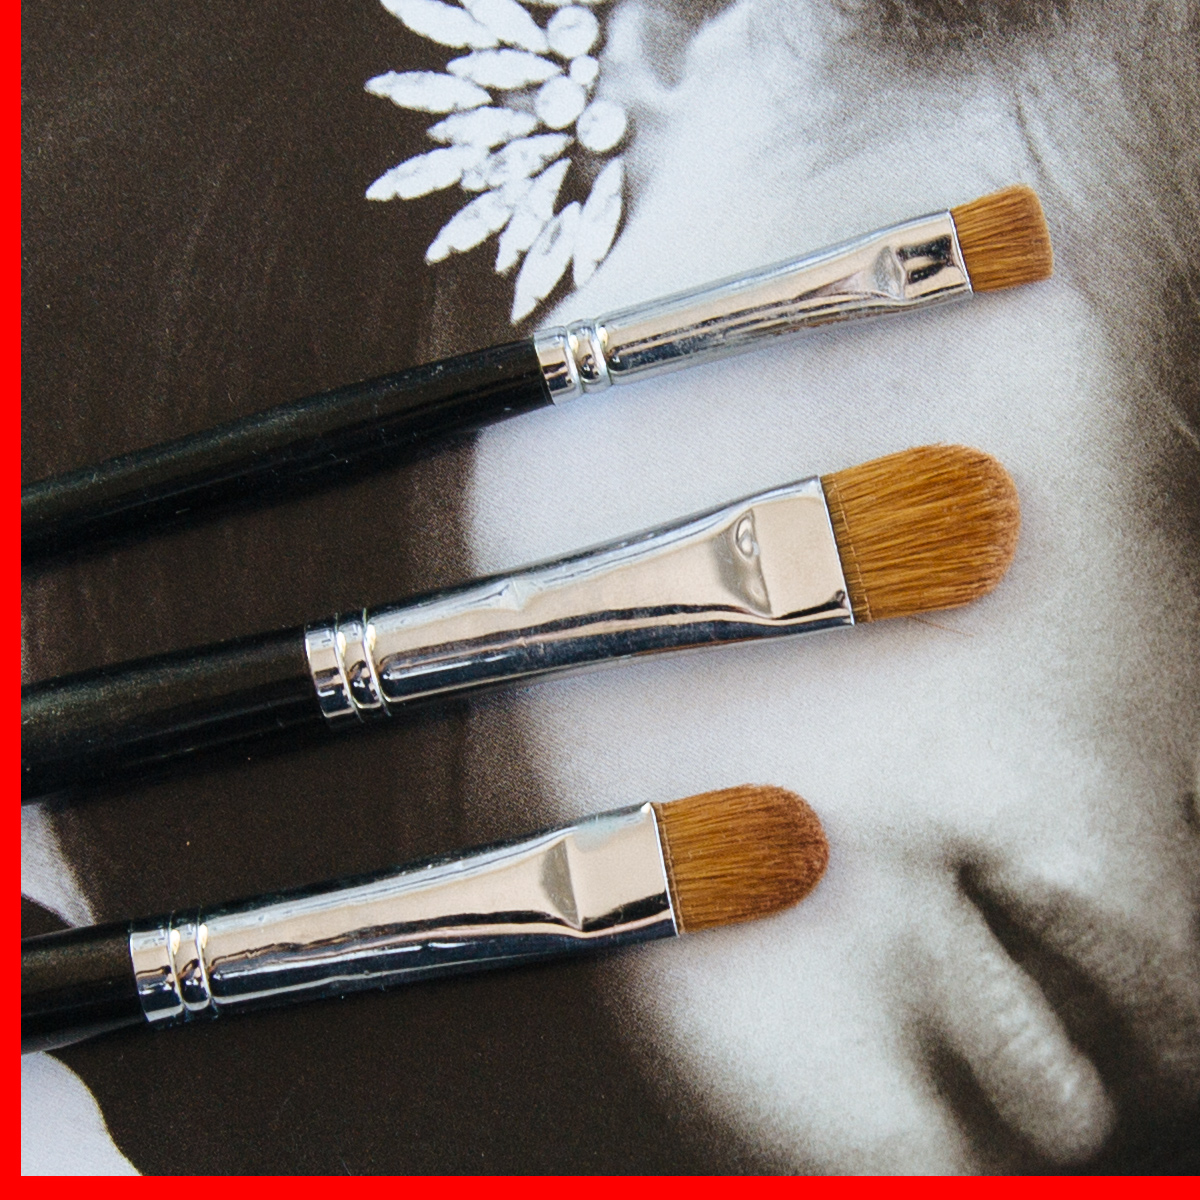 Stylesnooperdan-Beauty-Brushes-Eye-shadow-flat-brushes.jpg